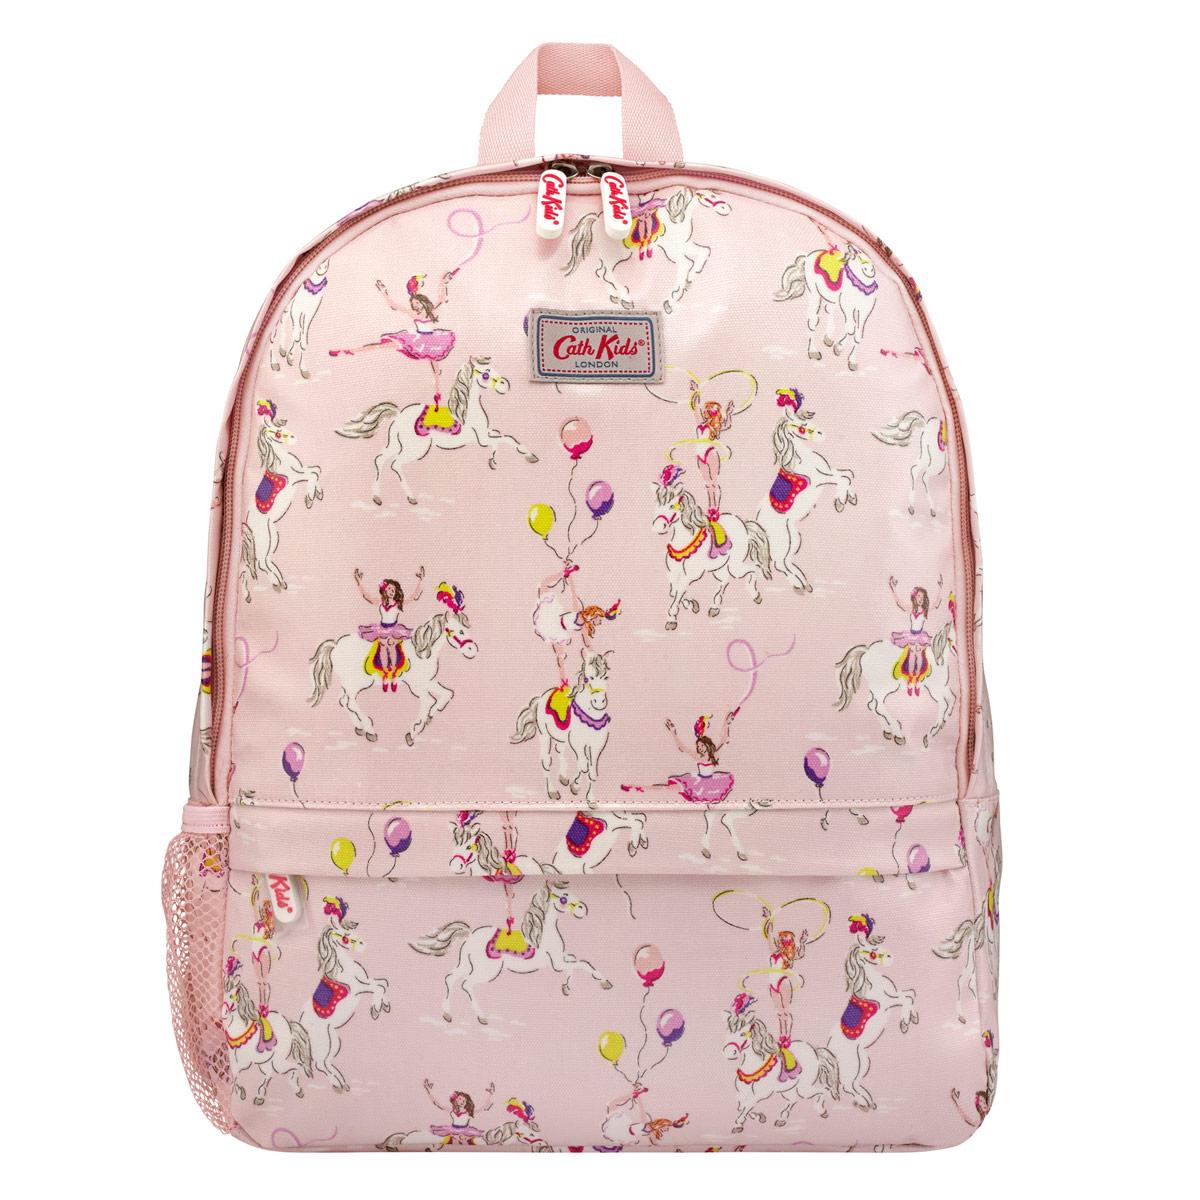 e60adeac59ab7 حقائب مدرسية